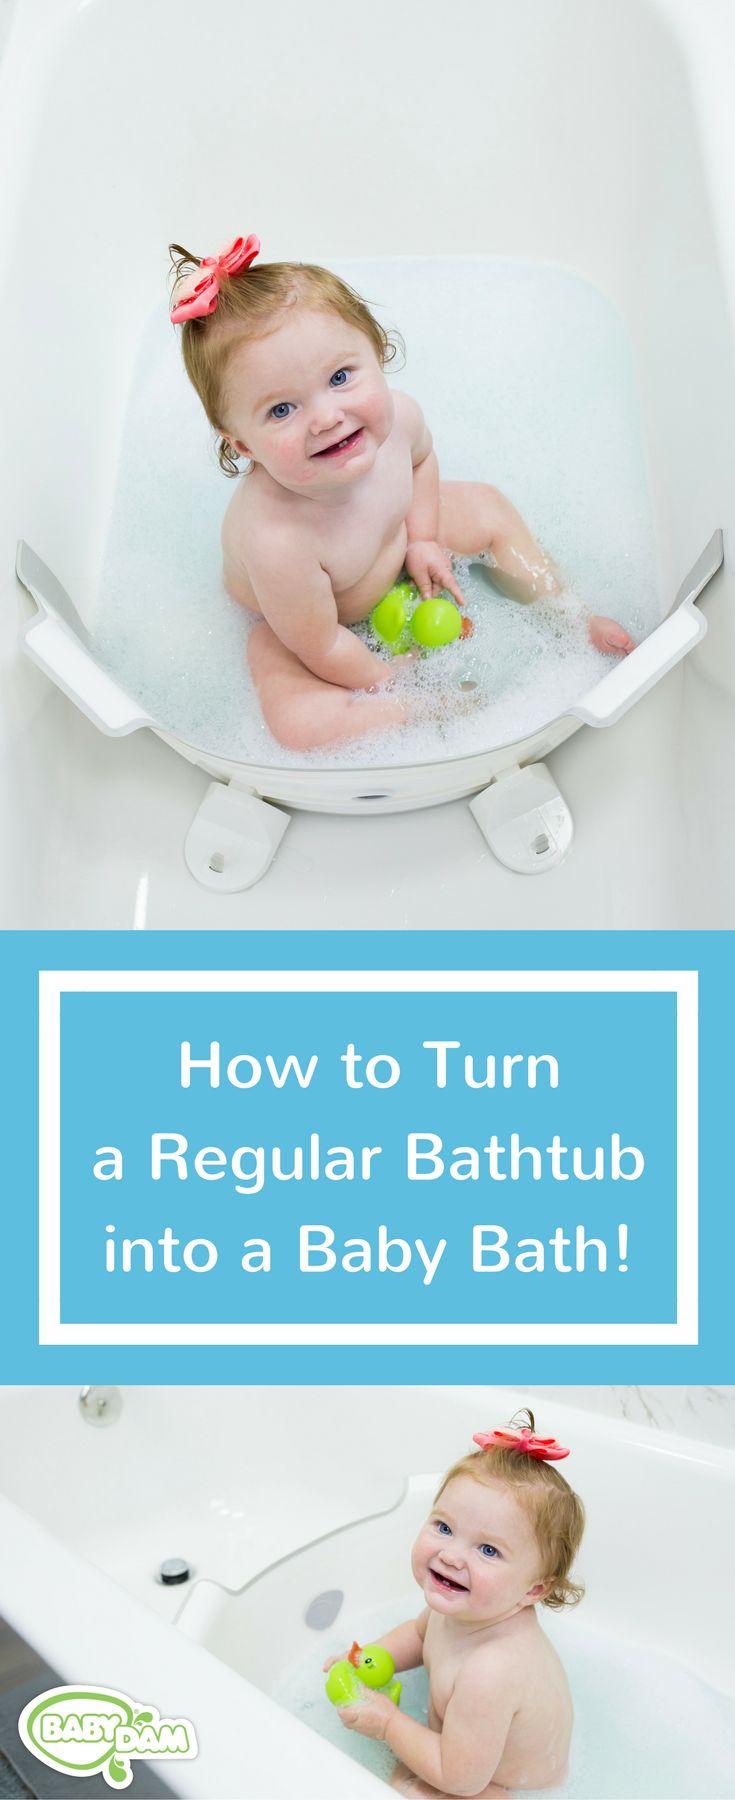 233 best Baby /Kid Gear images on Pinterest   Babies stuff, Babys ...